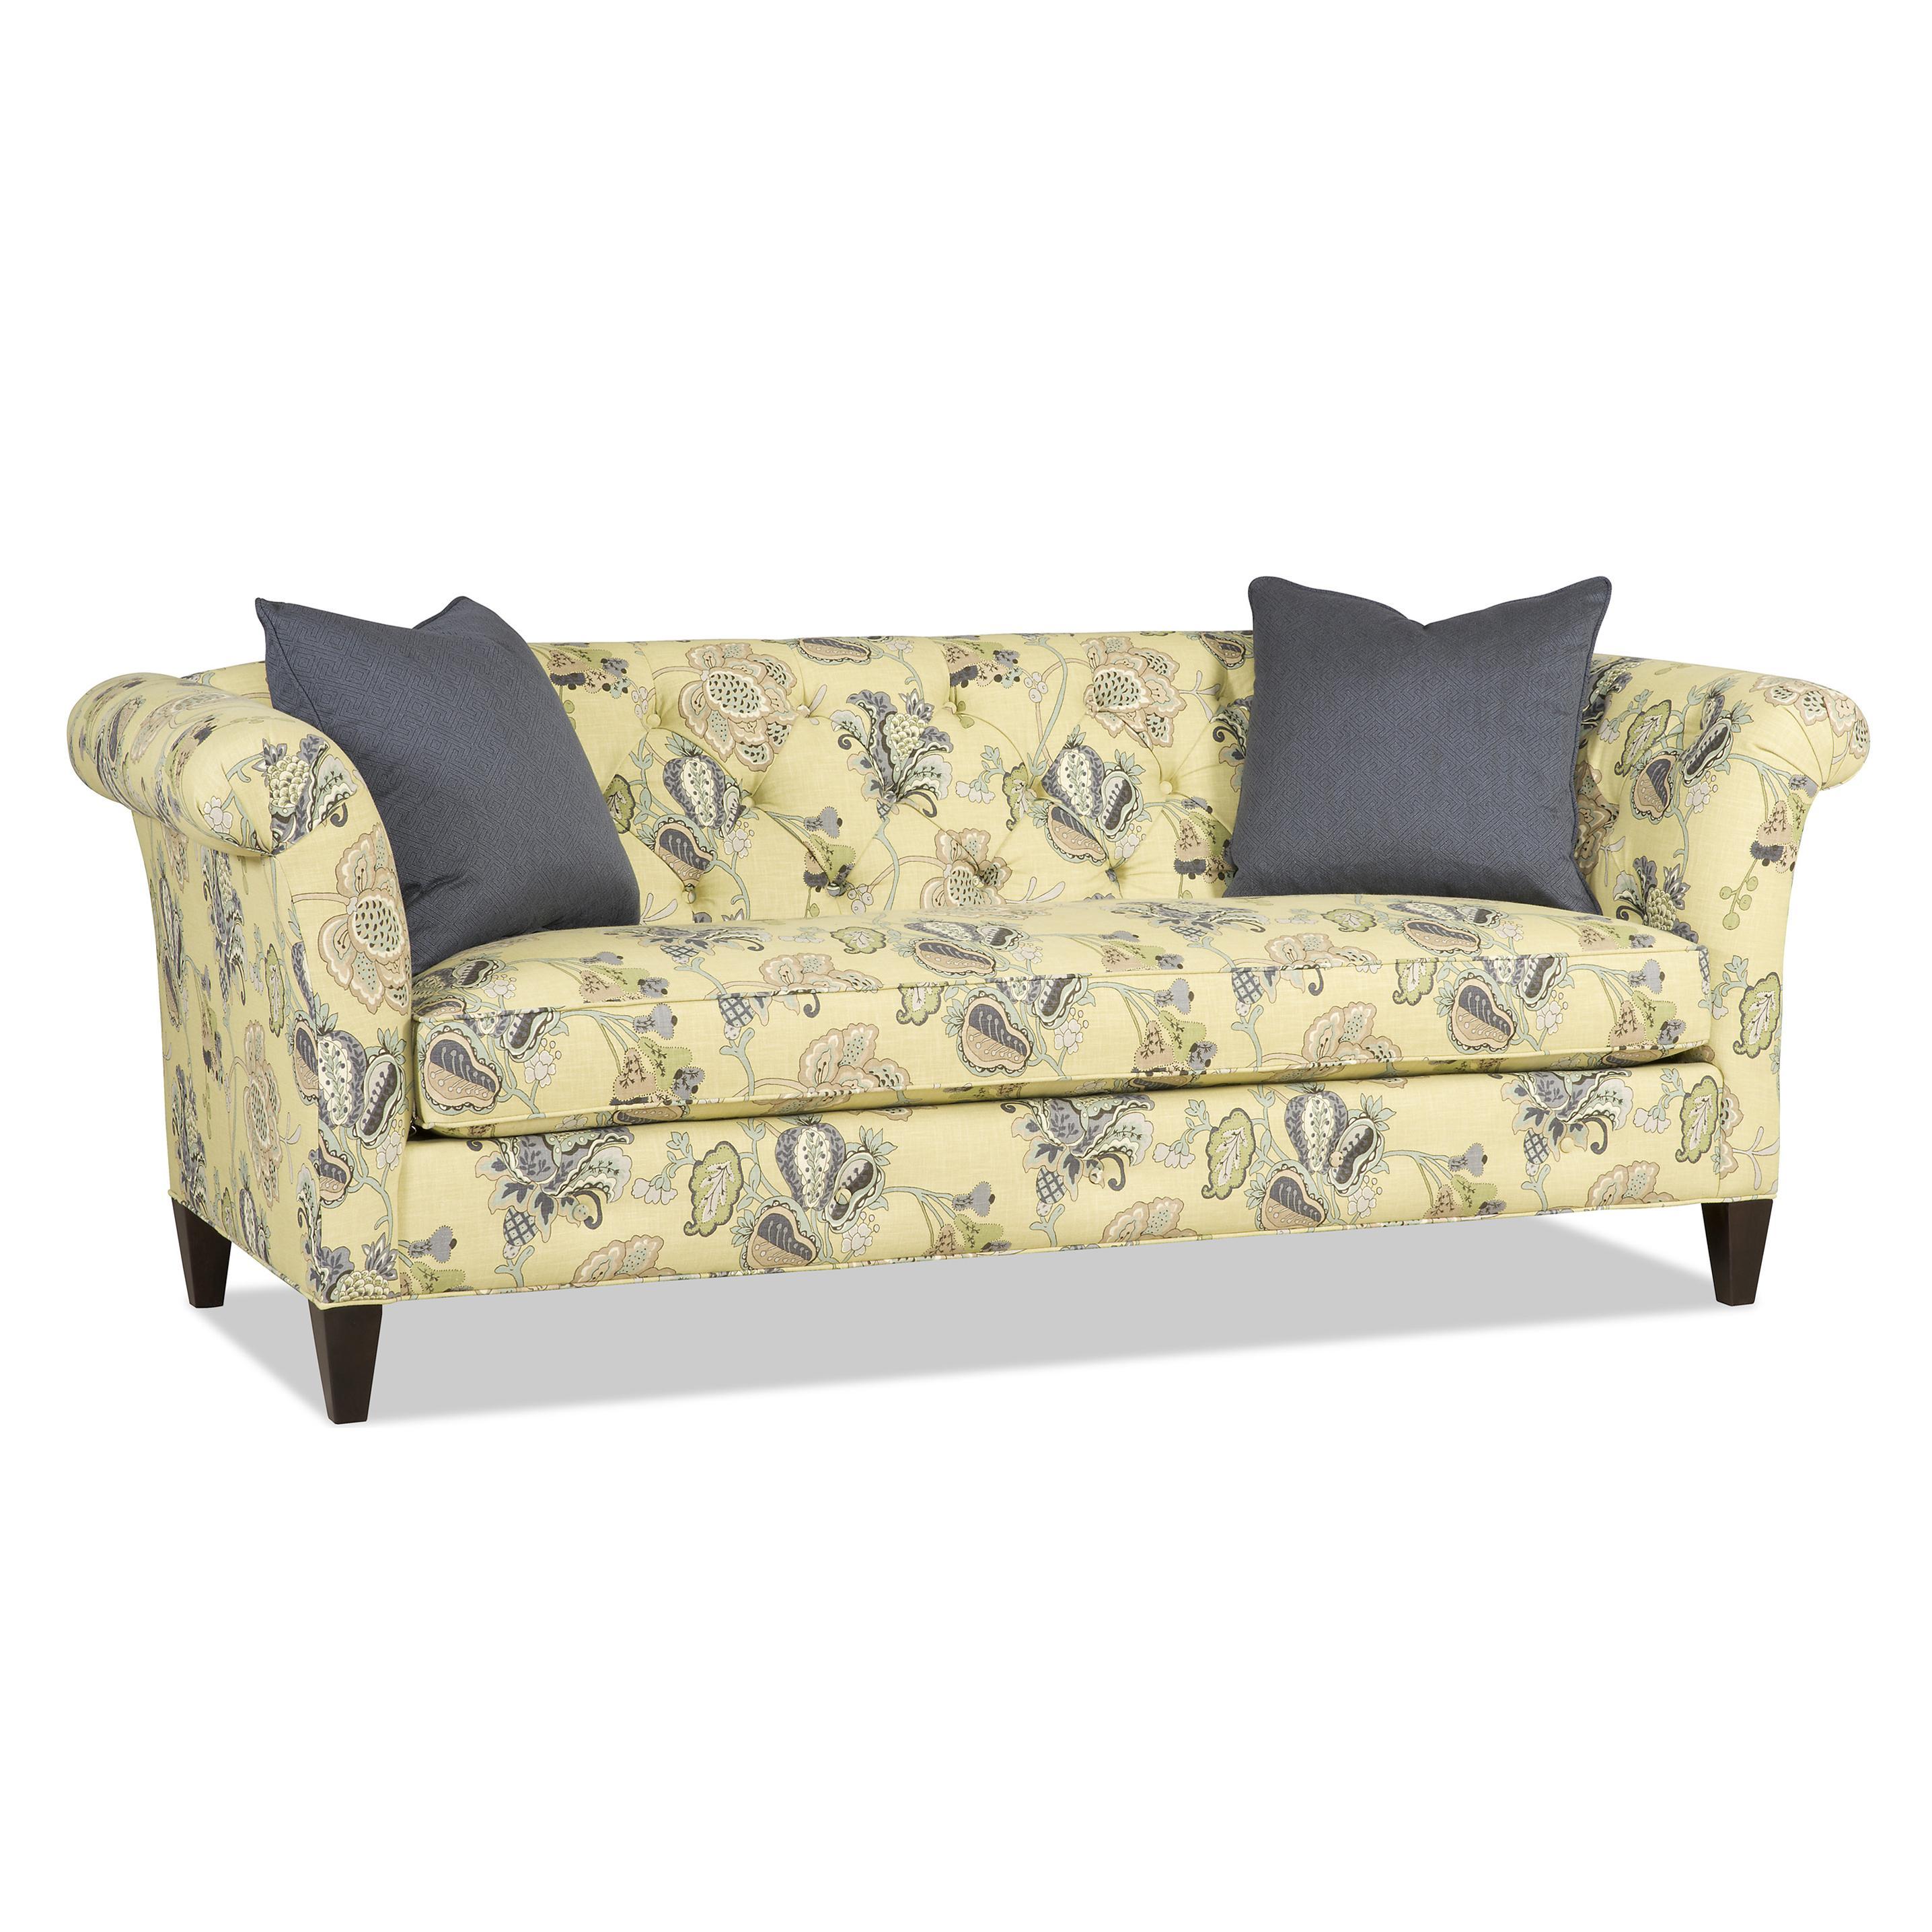 Astrid Traditional Bench Sofa at Williams & Kay